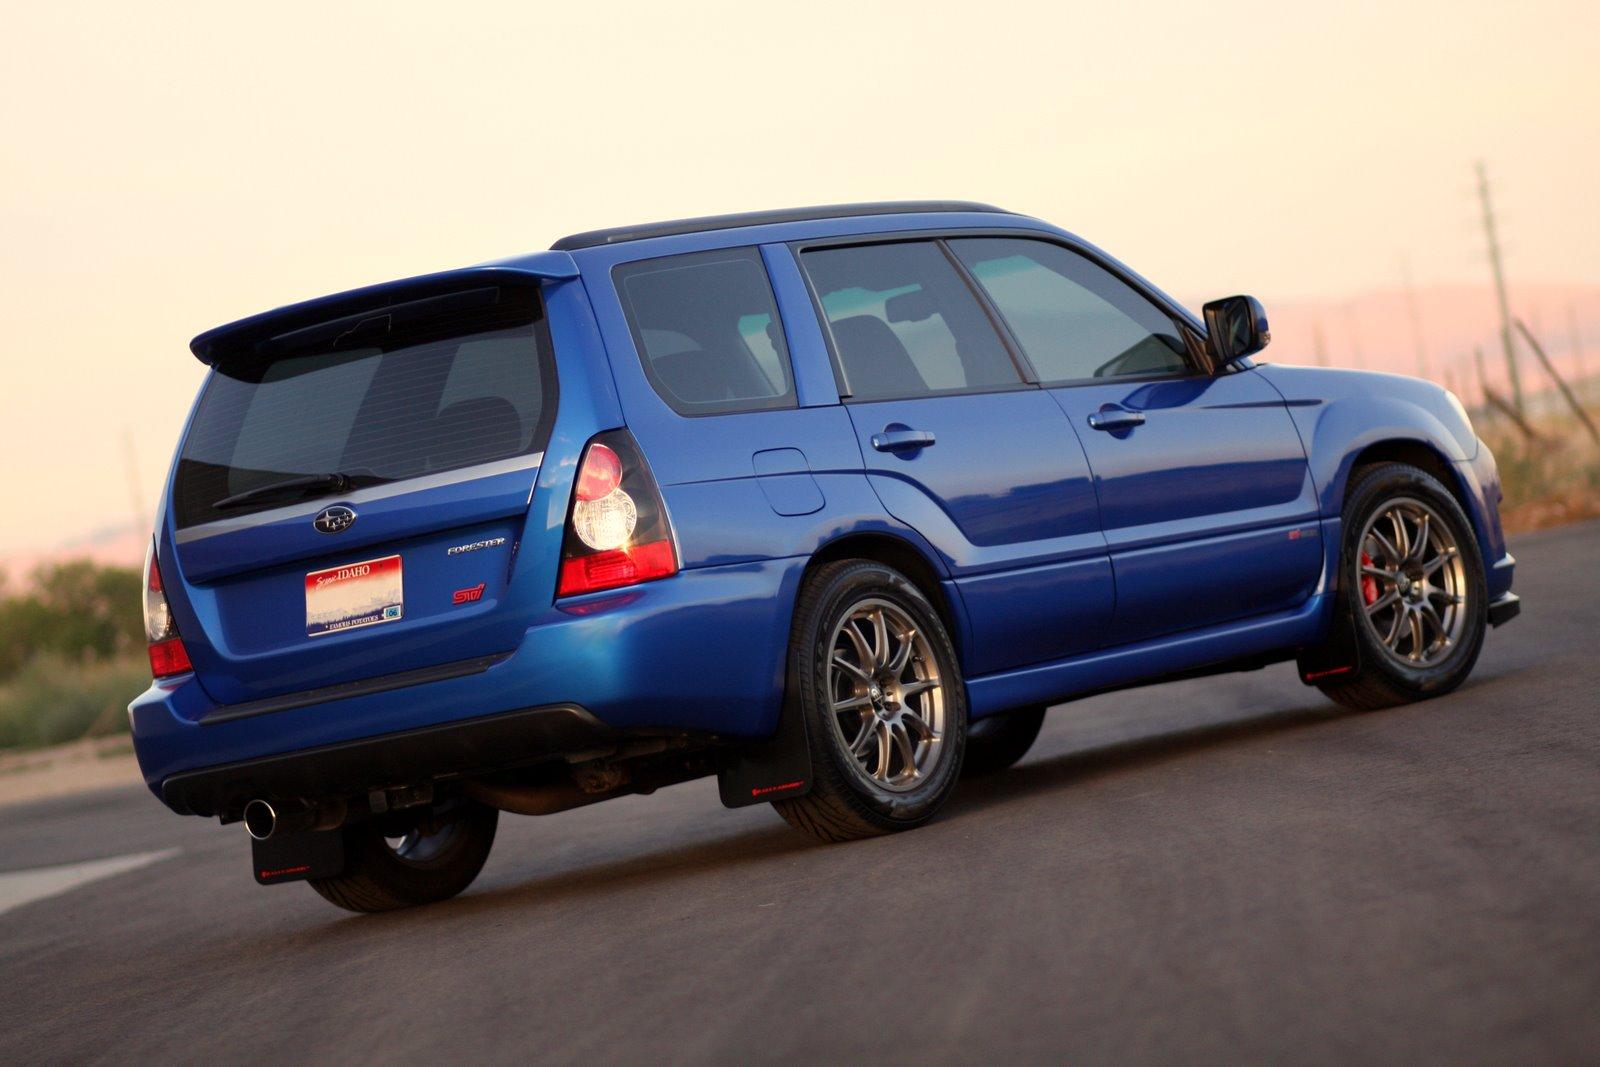 2007 Subaru Forester Image 17